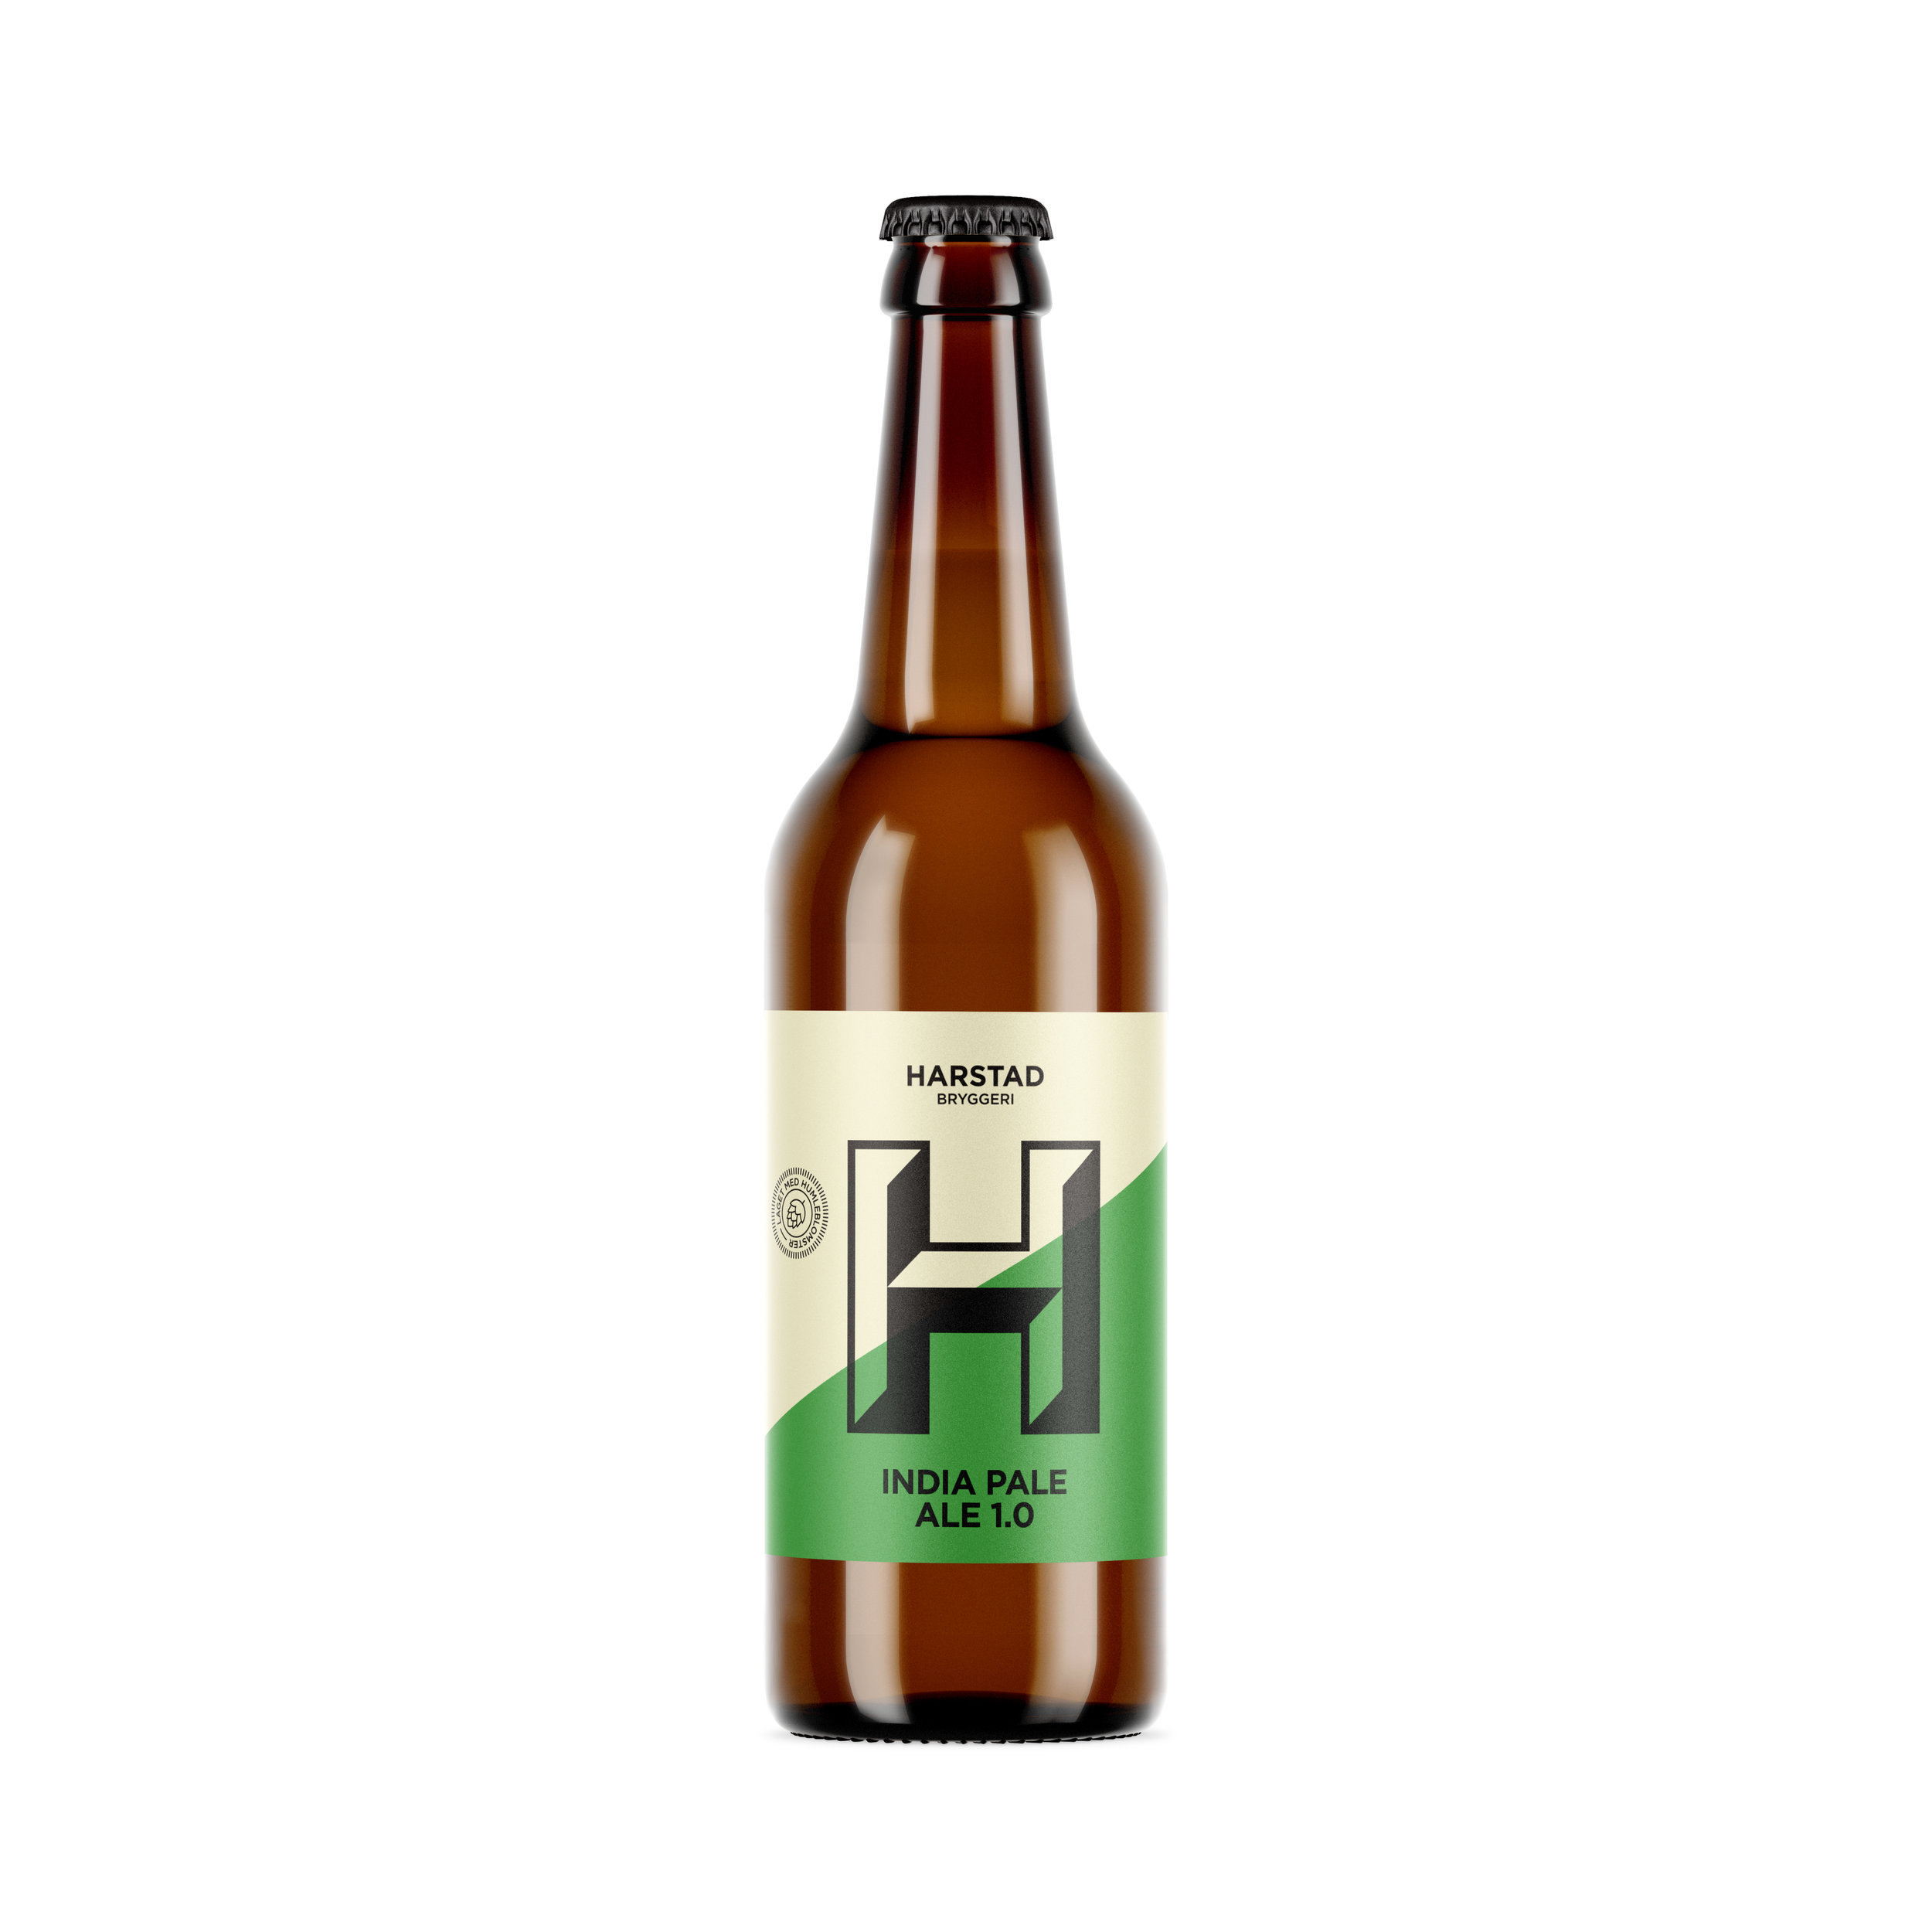 India Pale Ale 1.0